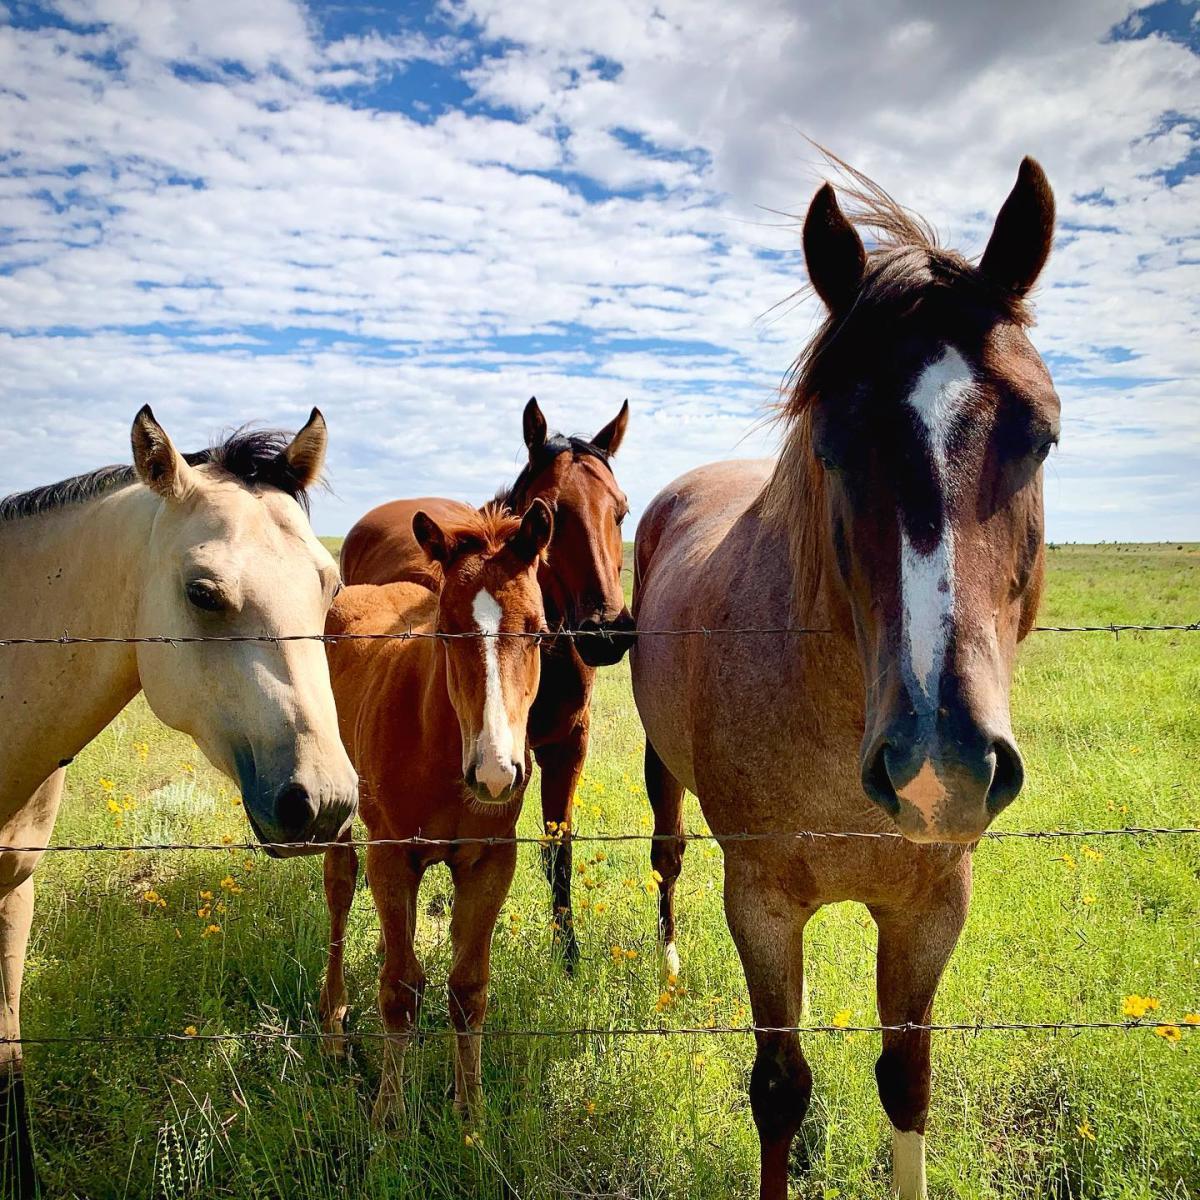 Horses Instagram Photo Contest Winner